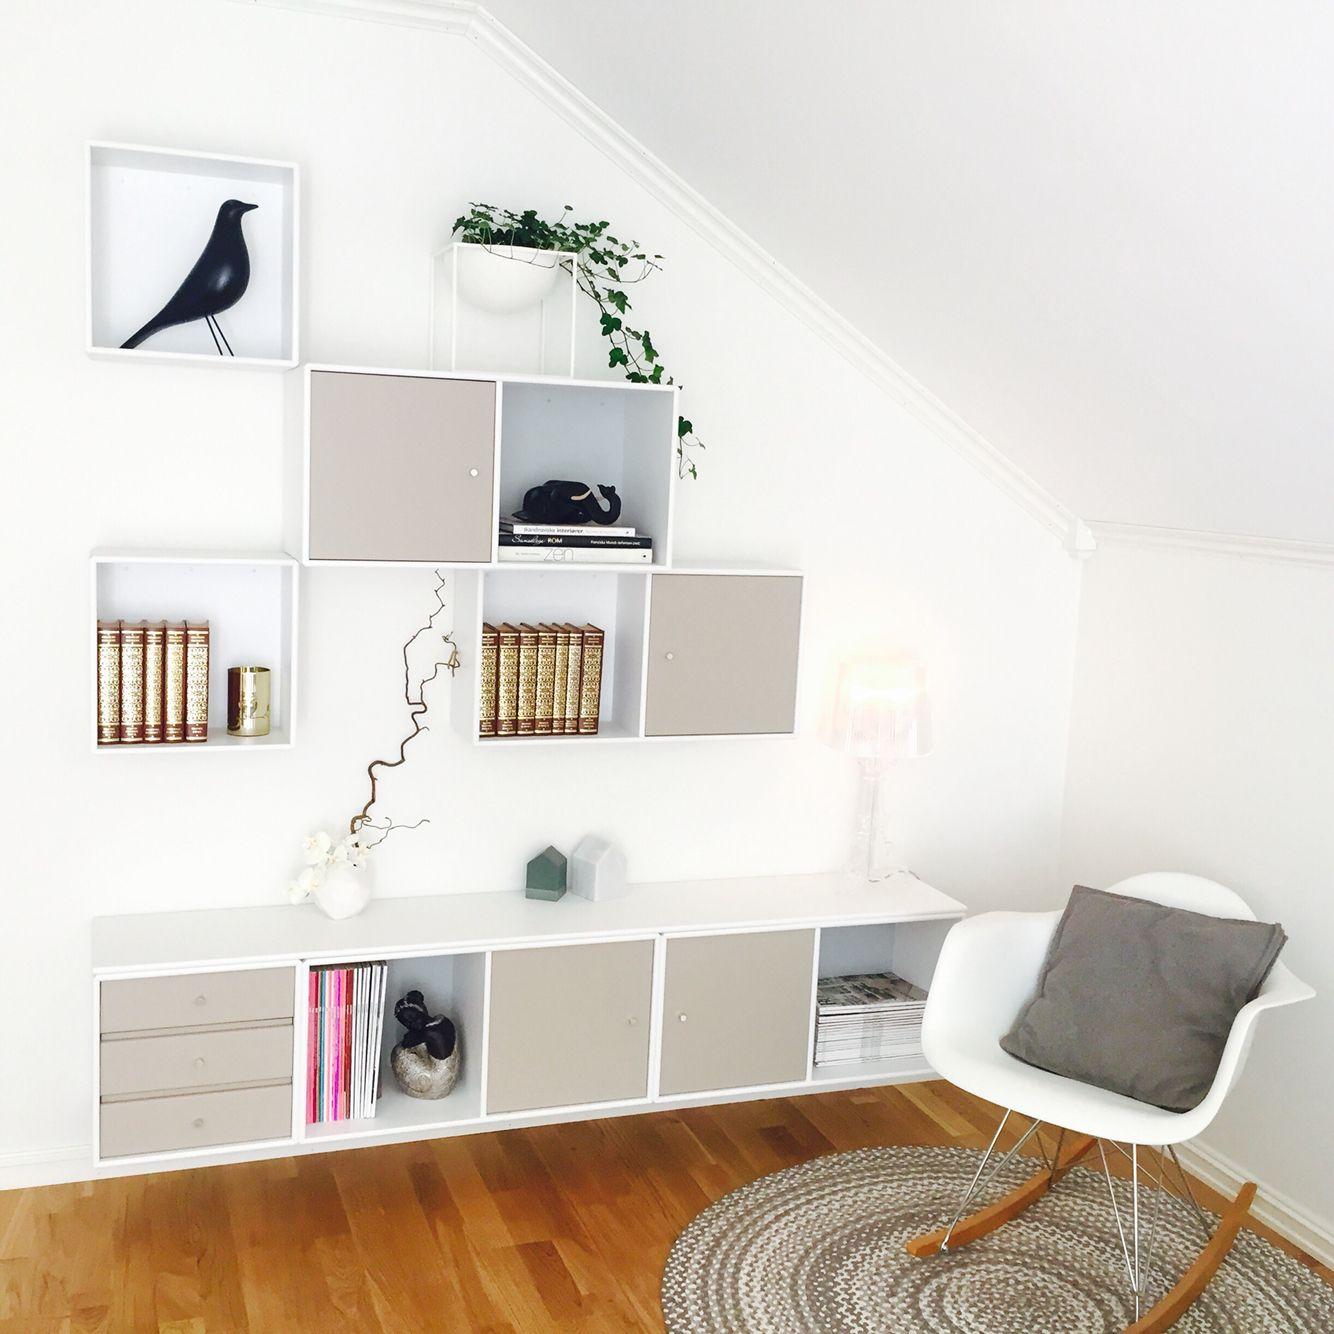 Montana Shelves Vitraeams For The Home Pinterest Montana Shelves And Living Rooms